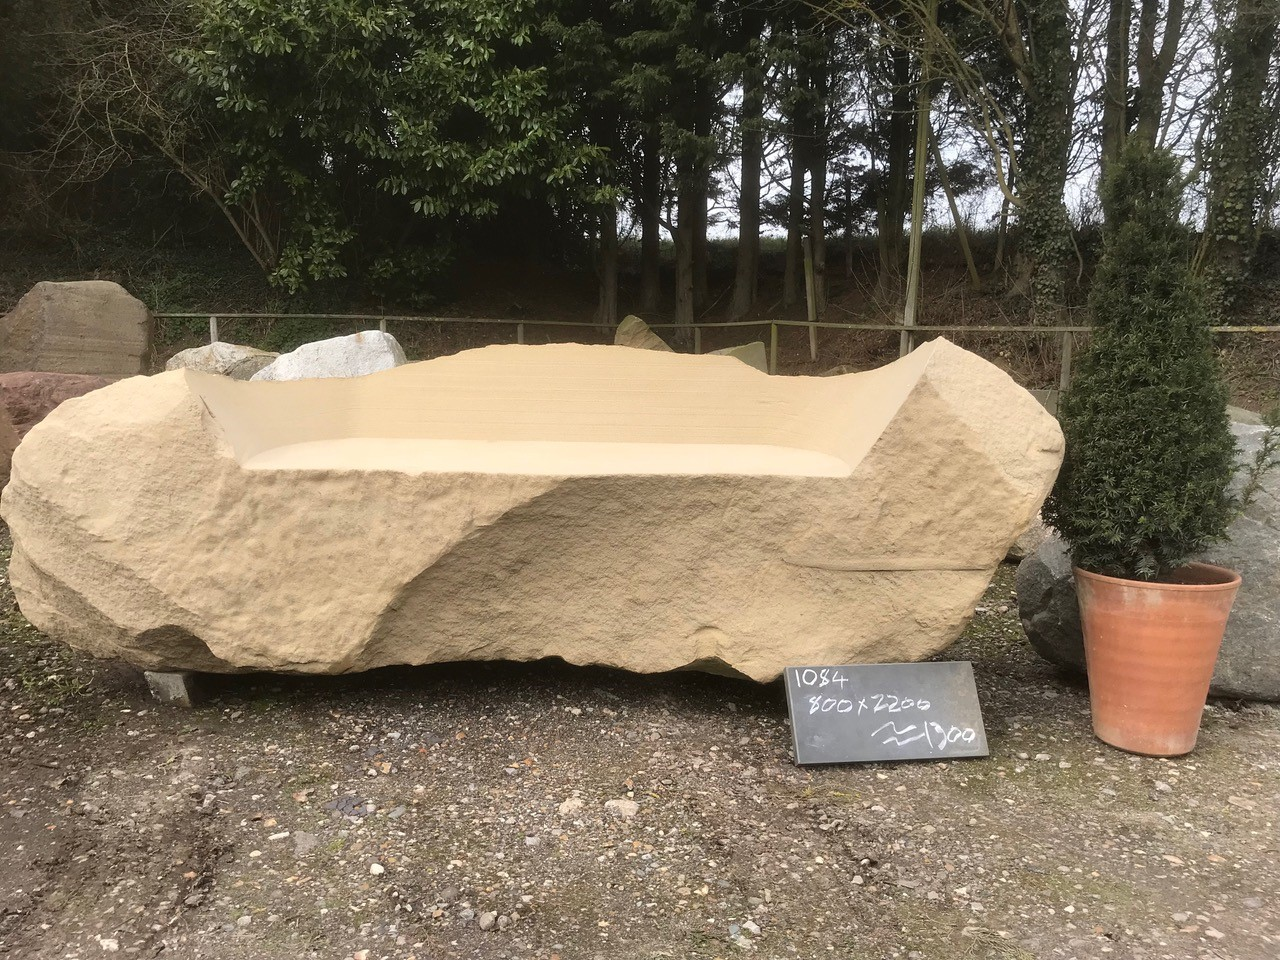 1084 - Sandstone Chunk Bench